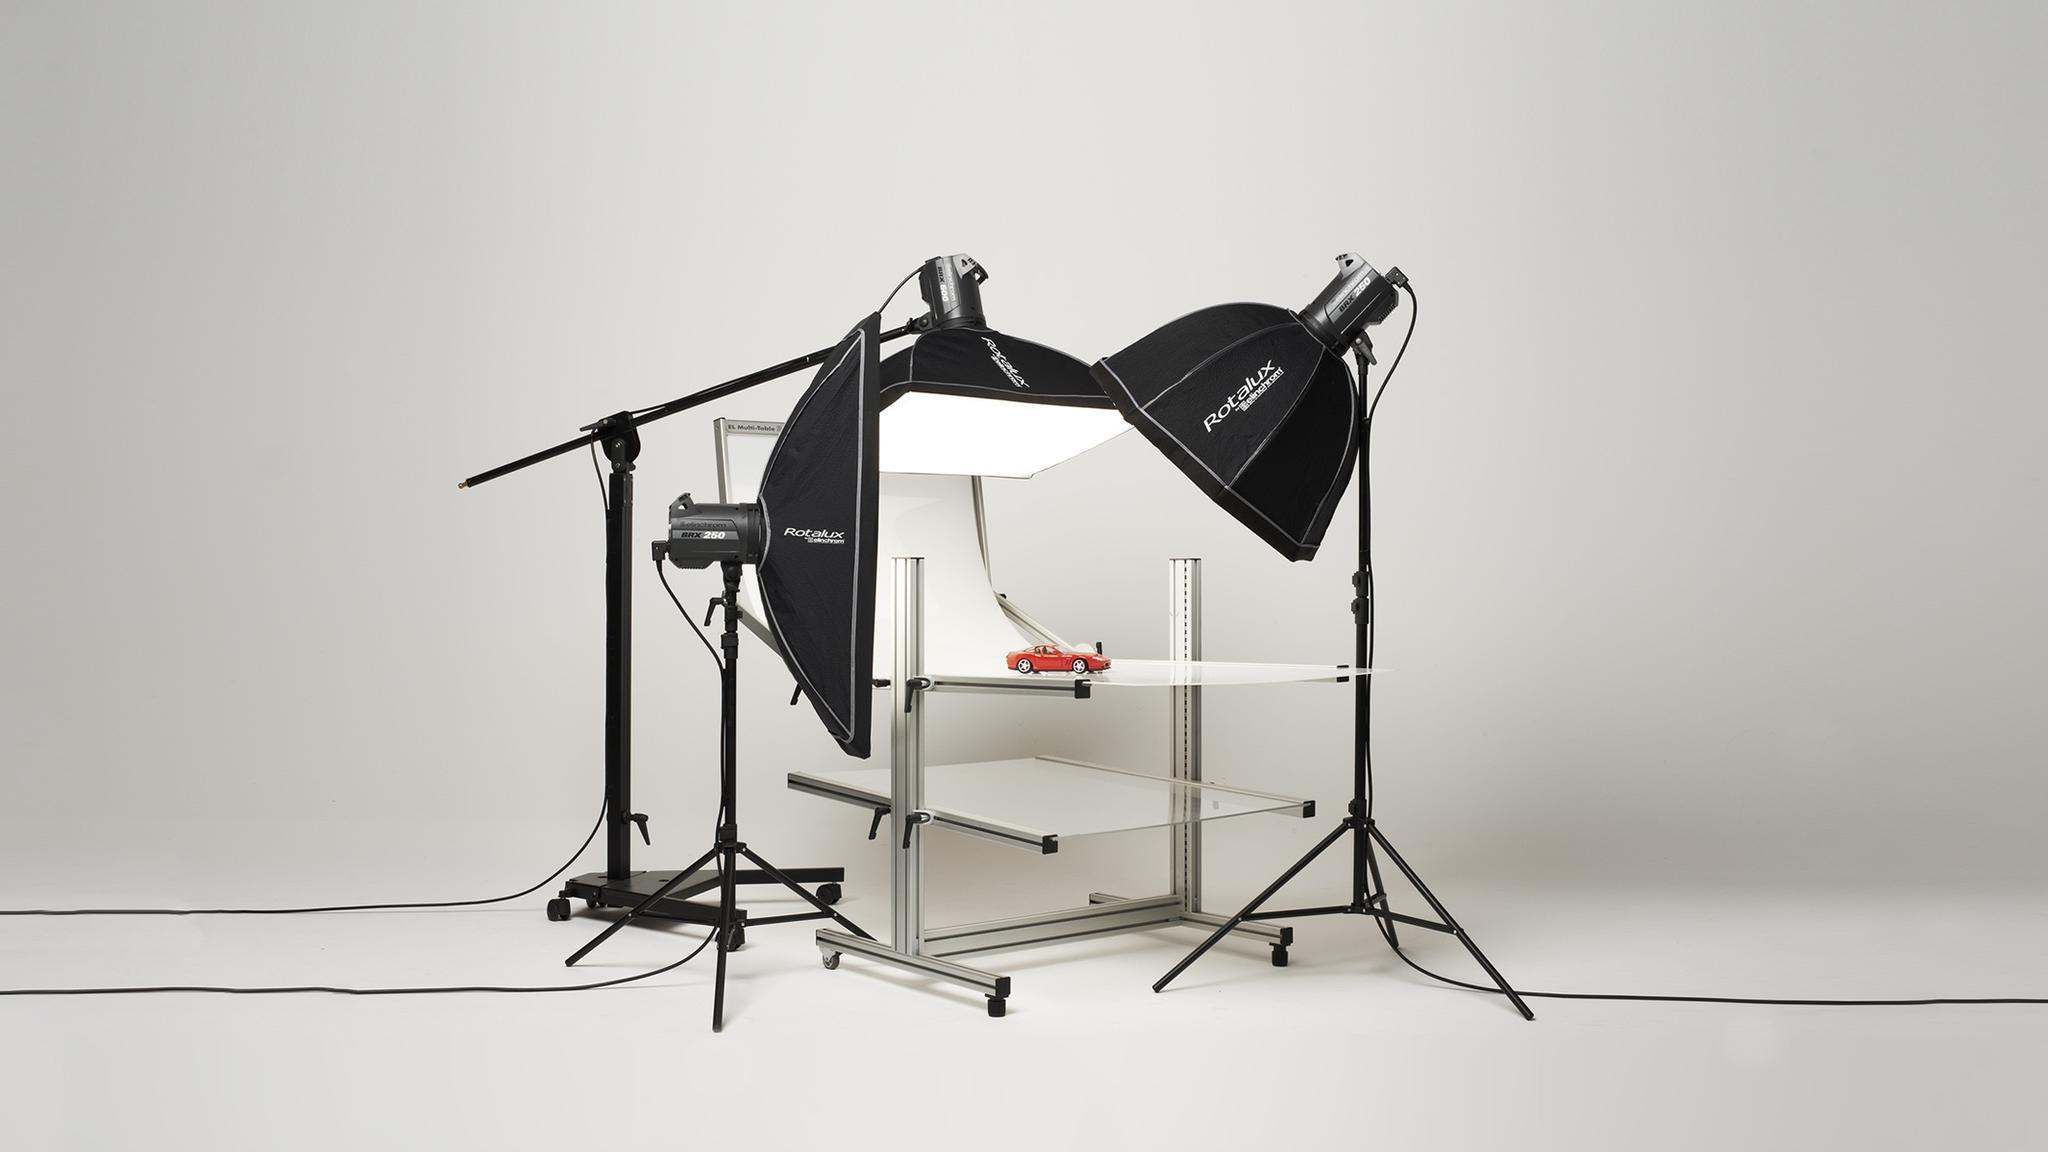 Elinchrom Studio Compact flitsers